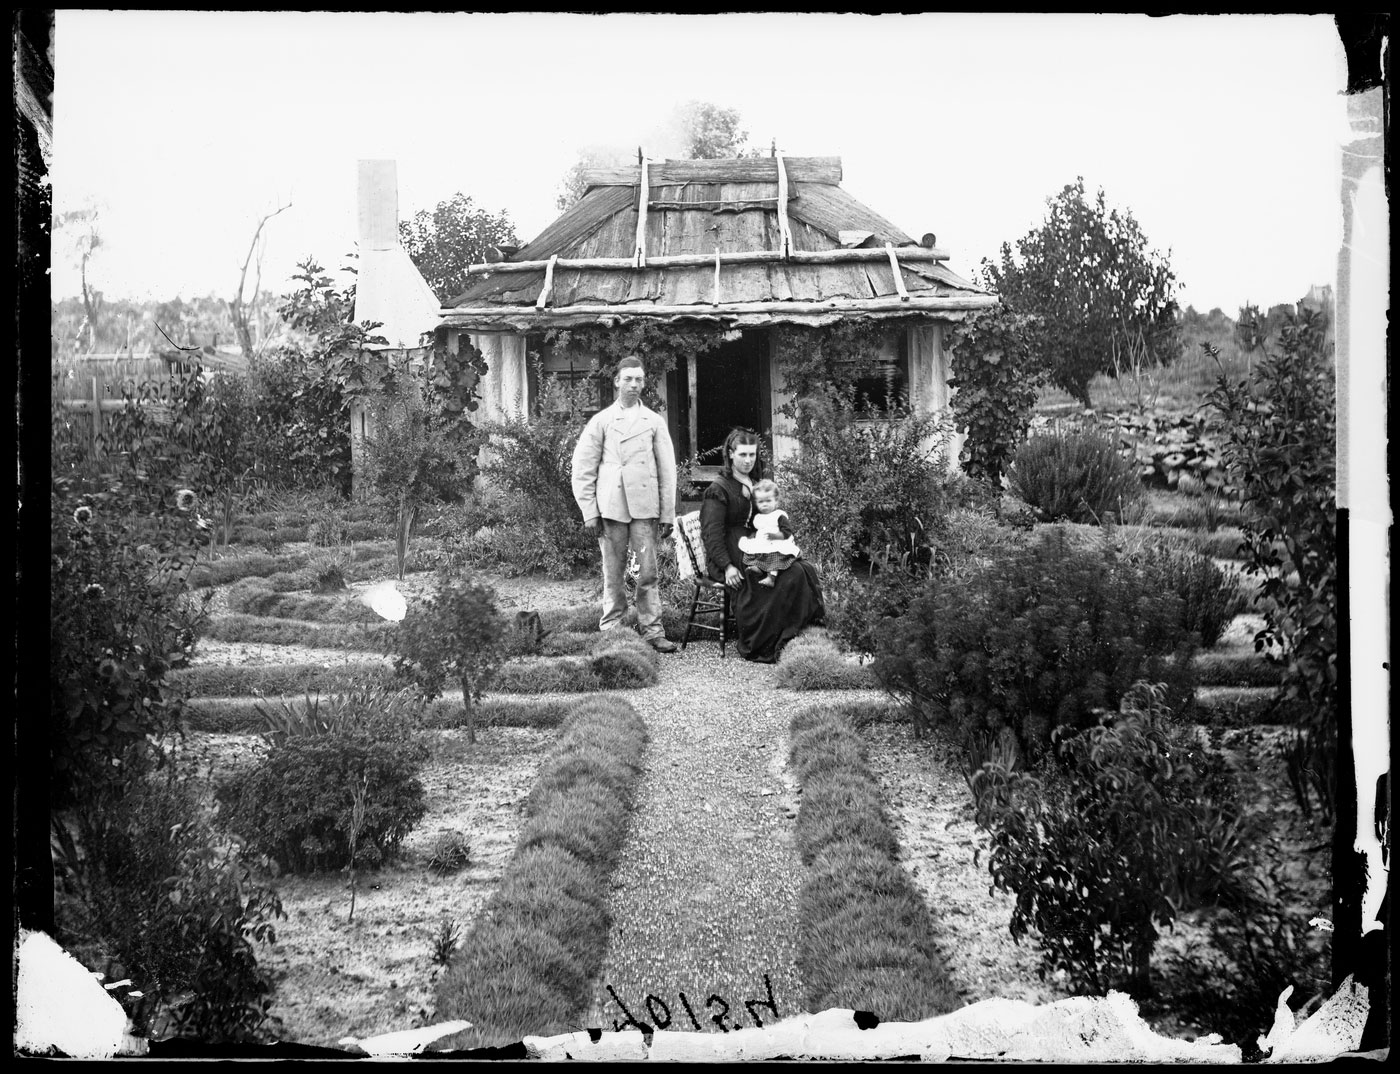 Australia in olden days on pinterest melbourne for American garden company